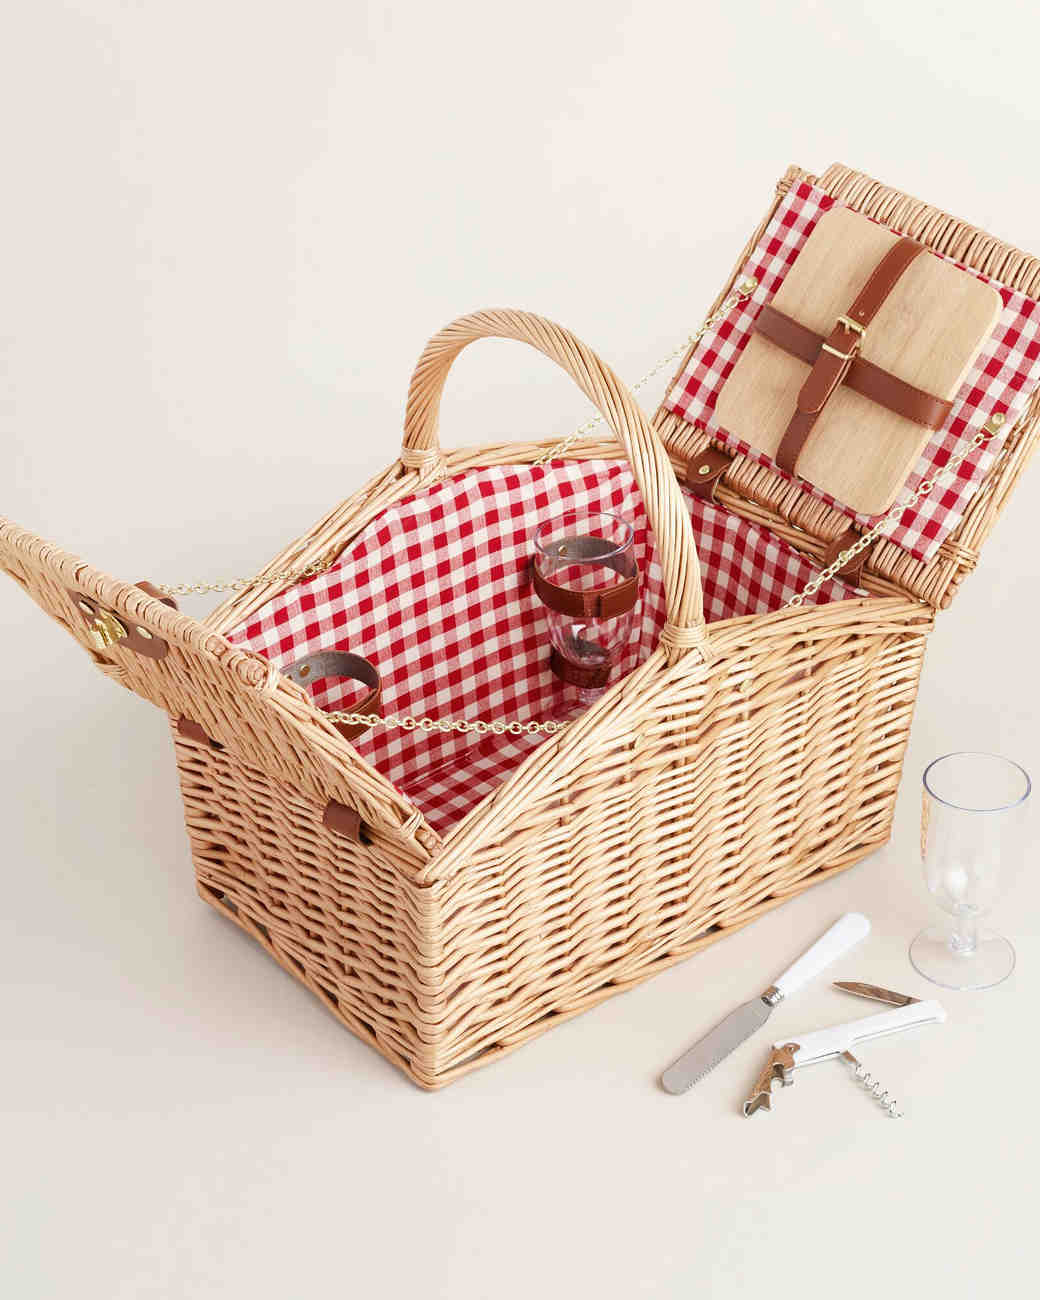 engagement-gifts-world-market-picnic-basket-0516.jpg